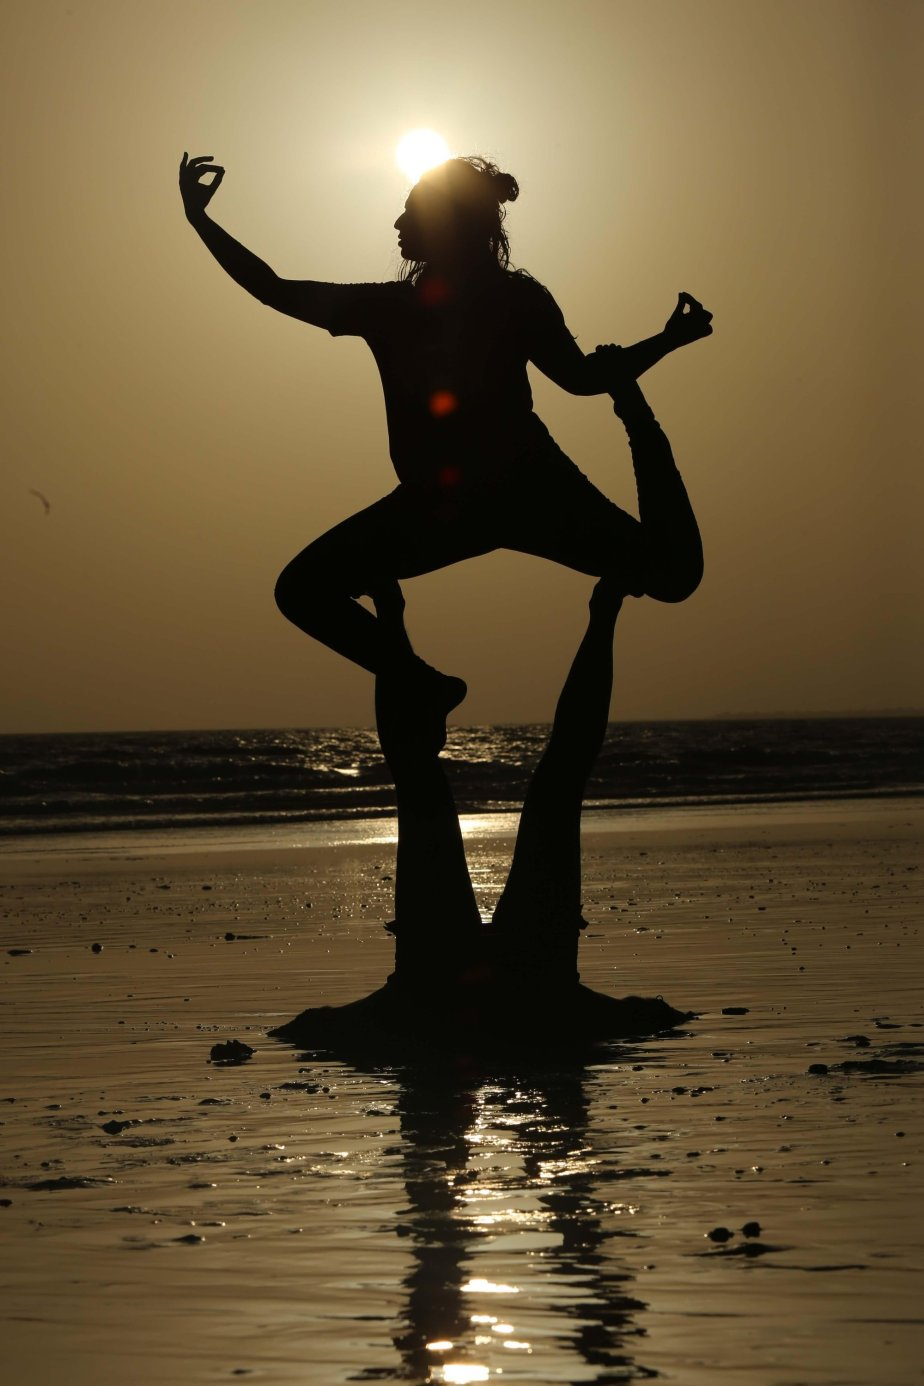 dhanak-aijaz-practicing-yoga-in-karachi